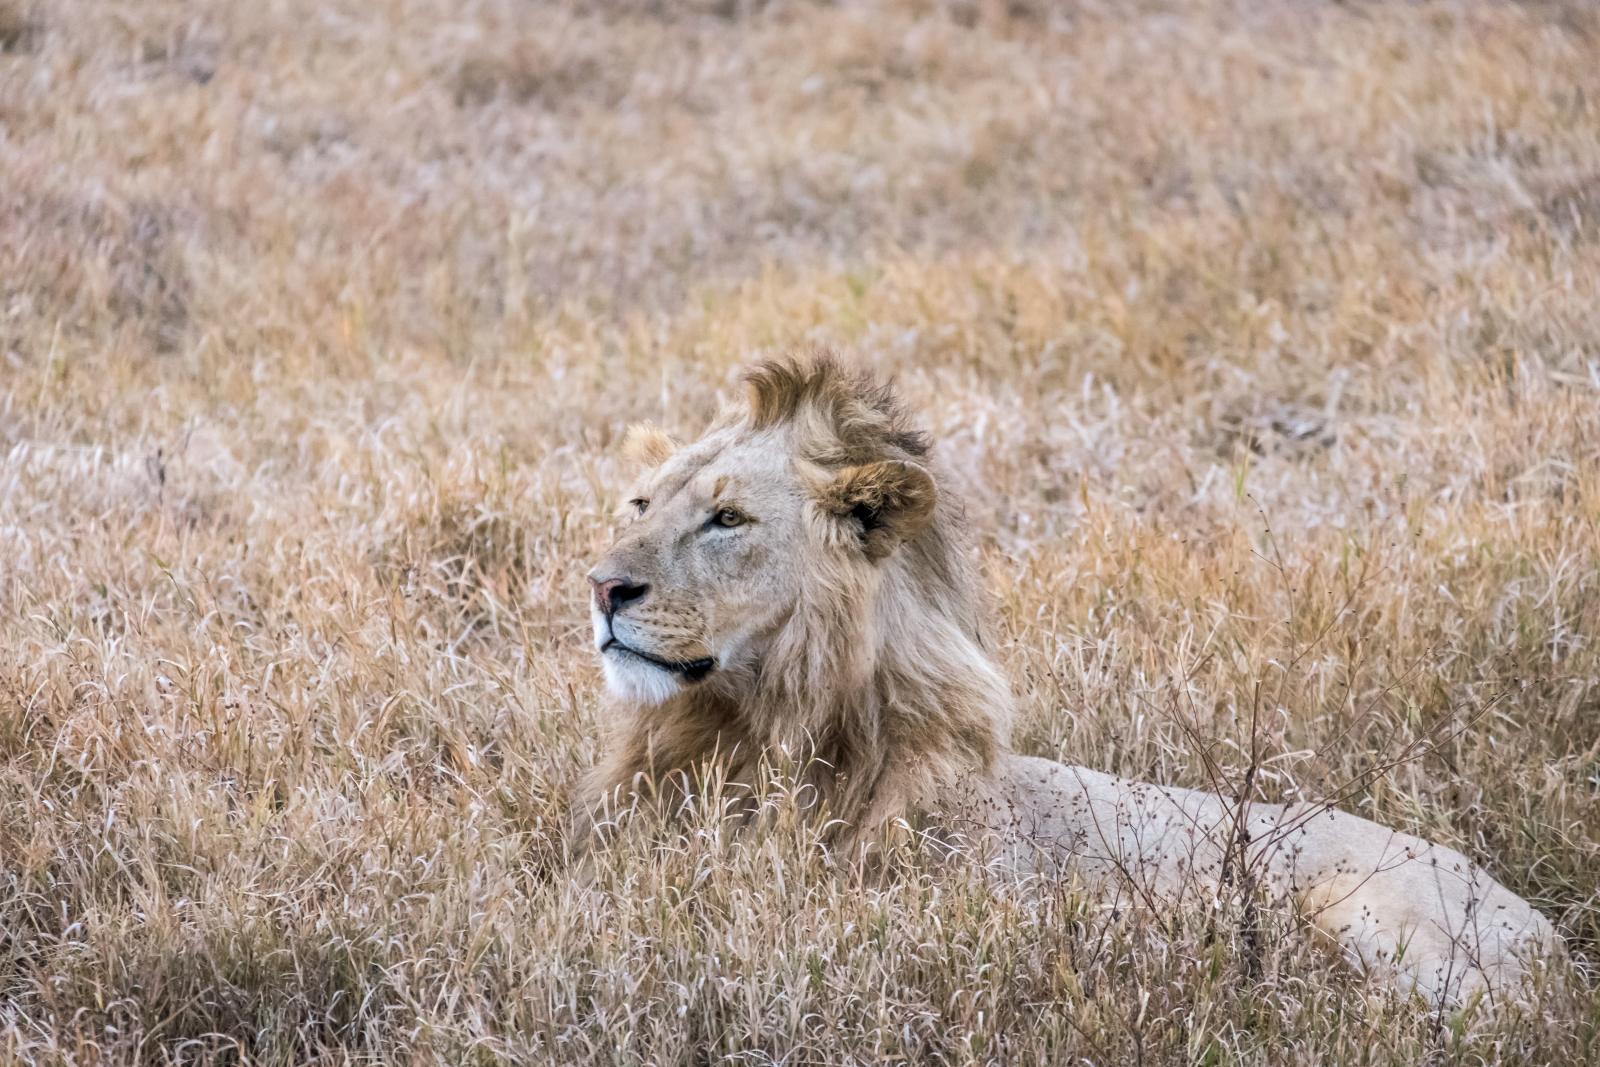 Travel photography gear - Lion Tanzania